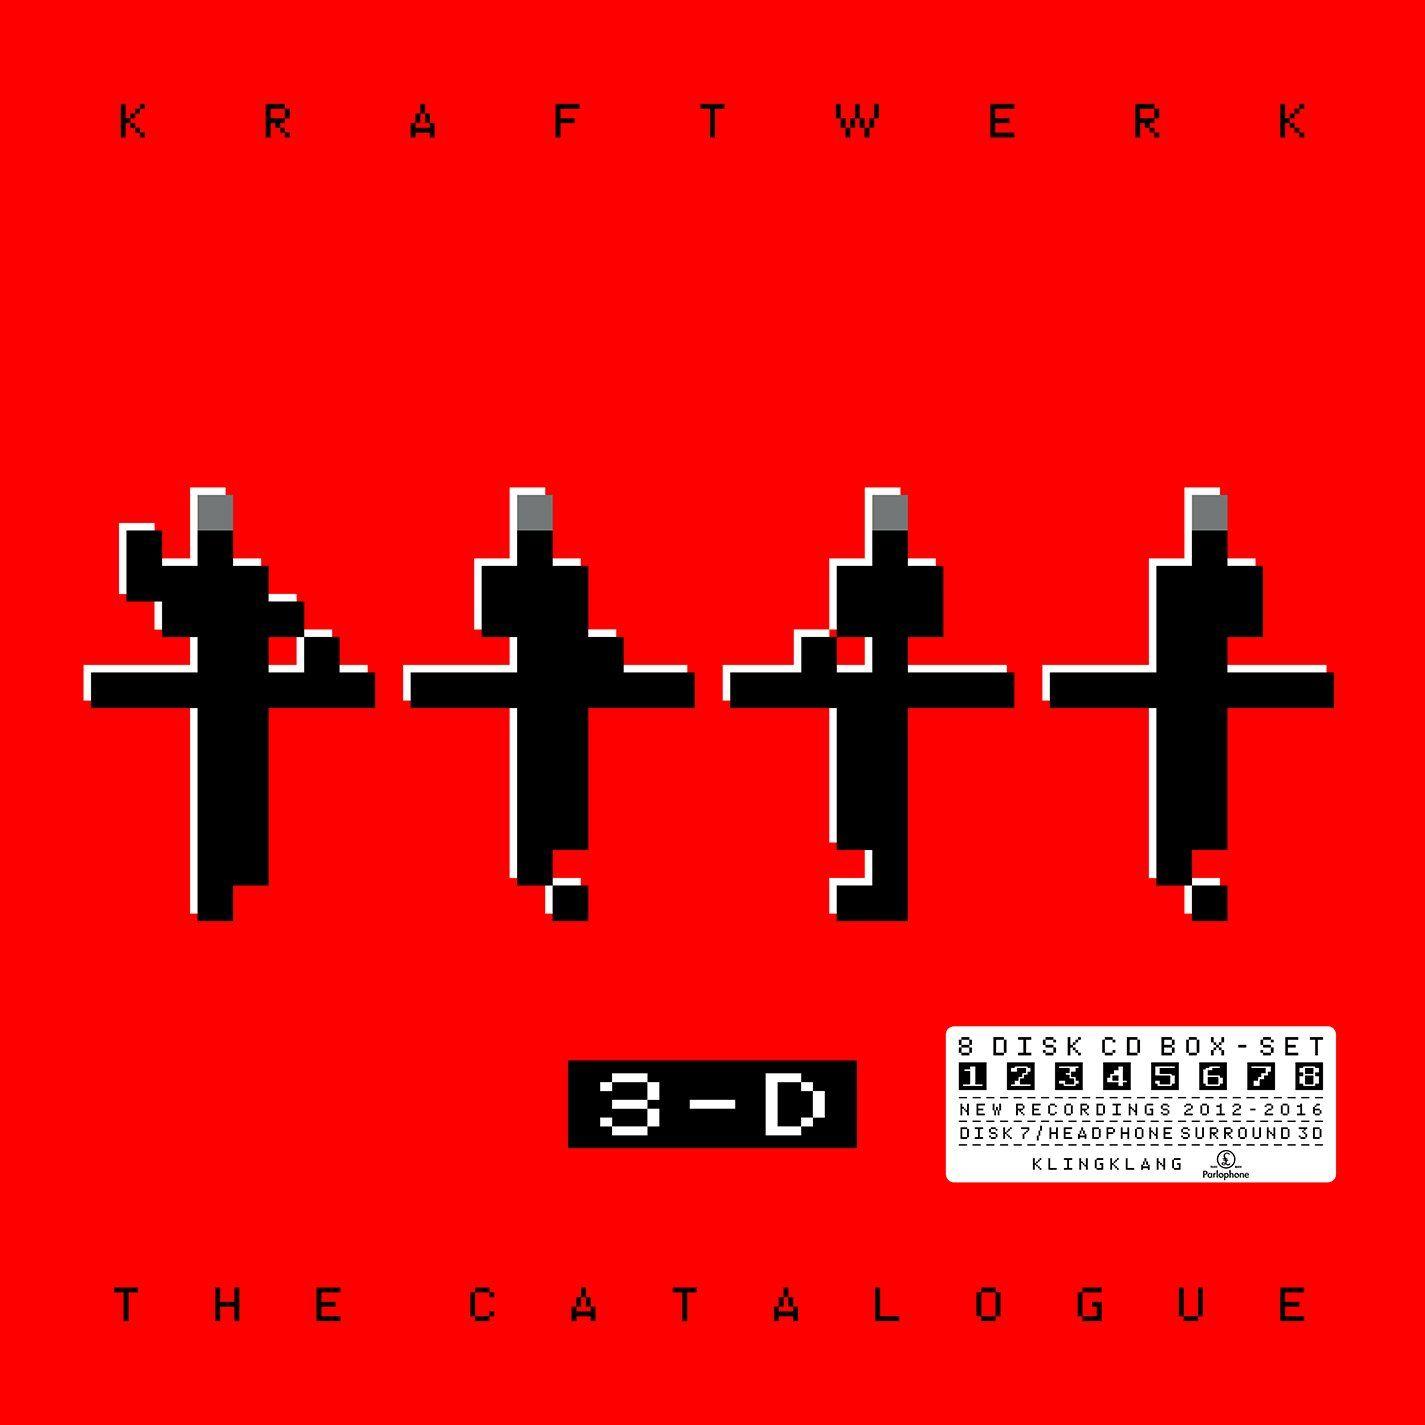 KRAFTWERK The Catalogue 8 CD Box